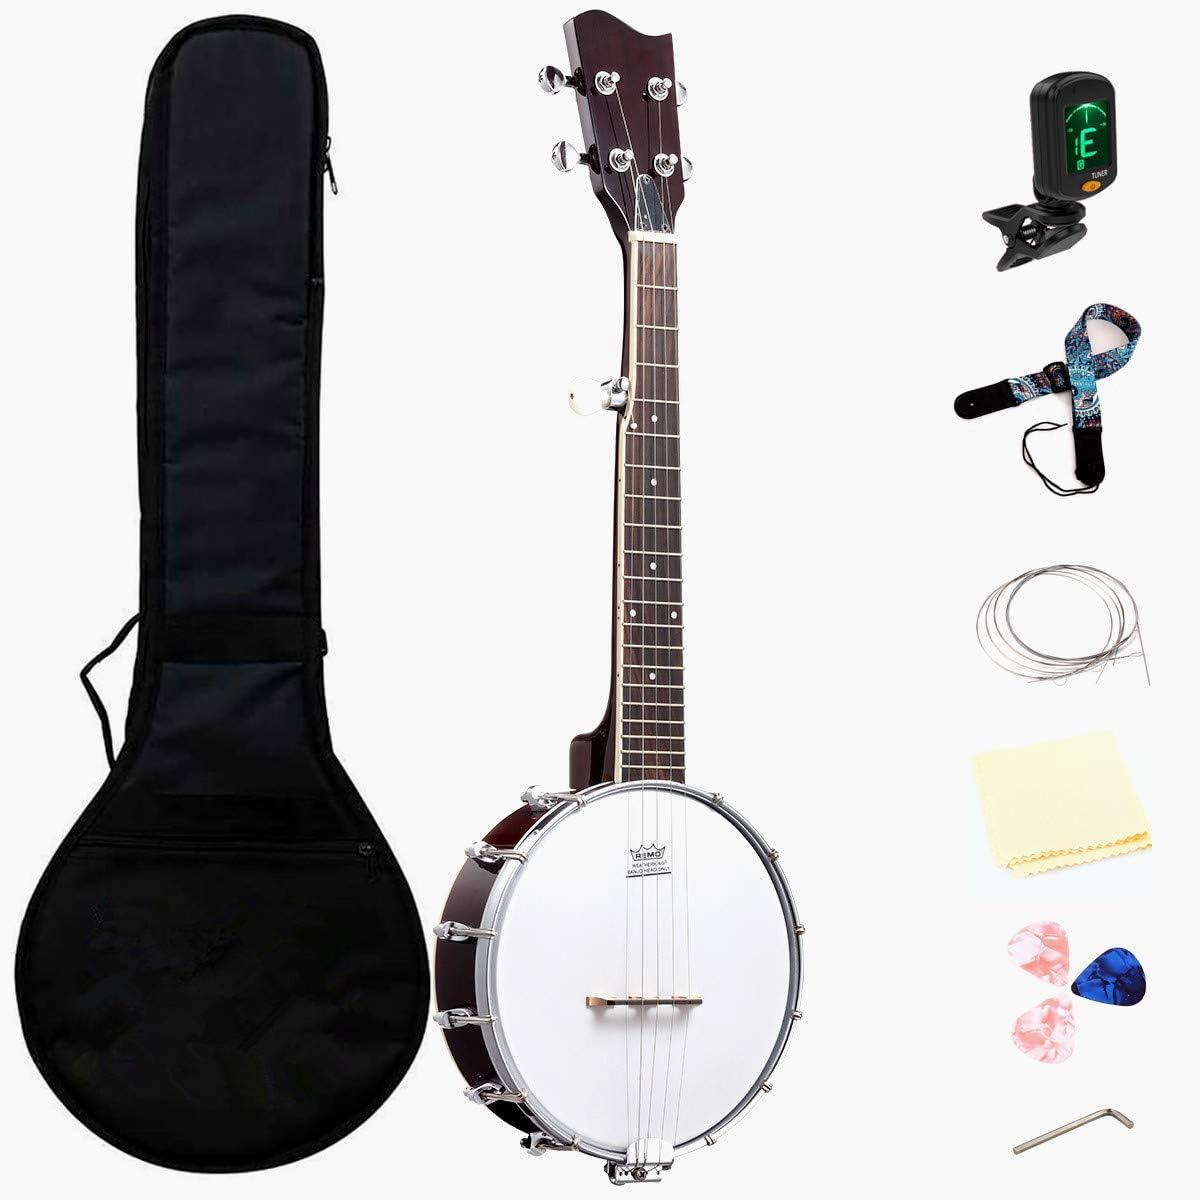 JeuRon 26 Inch Tenor Size Banjo Mini Oklahoma City Mall Music Direct stock discount BeginnerProfessional